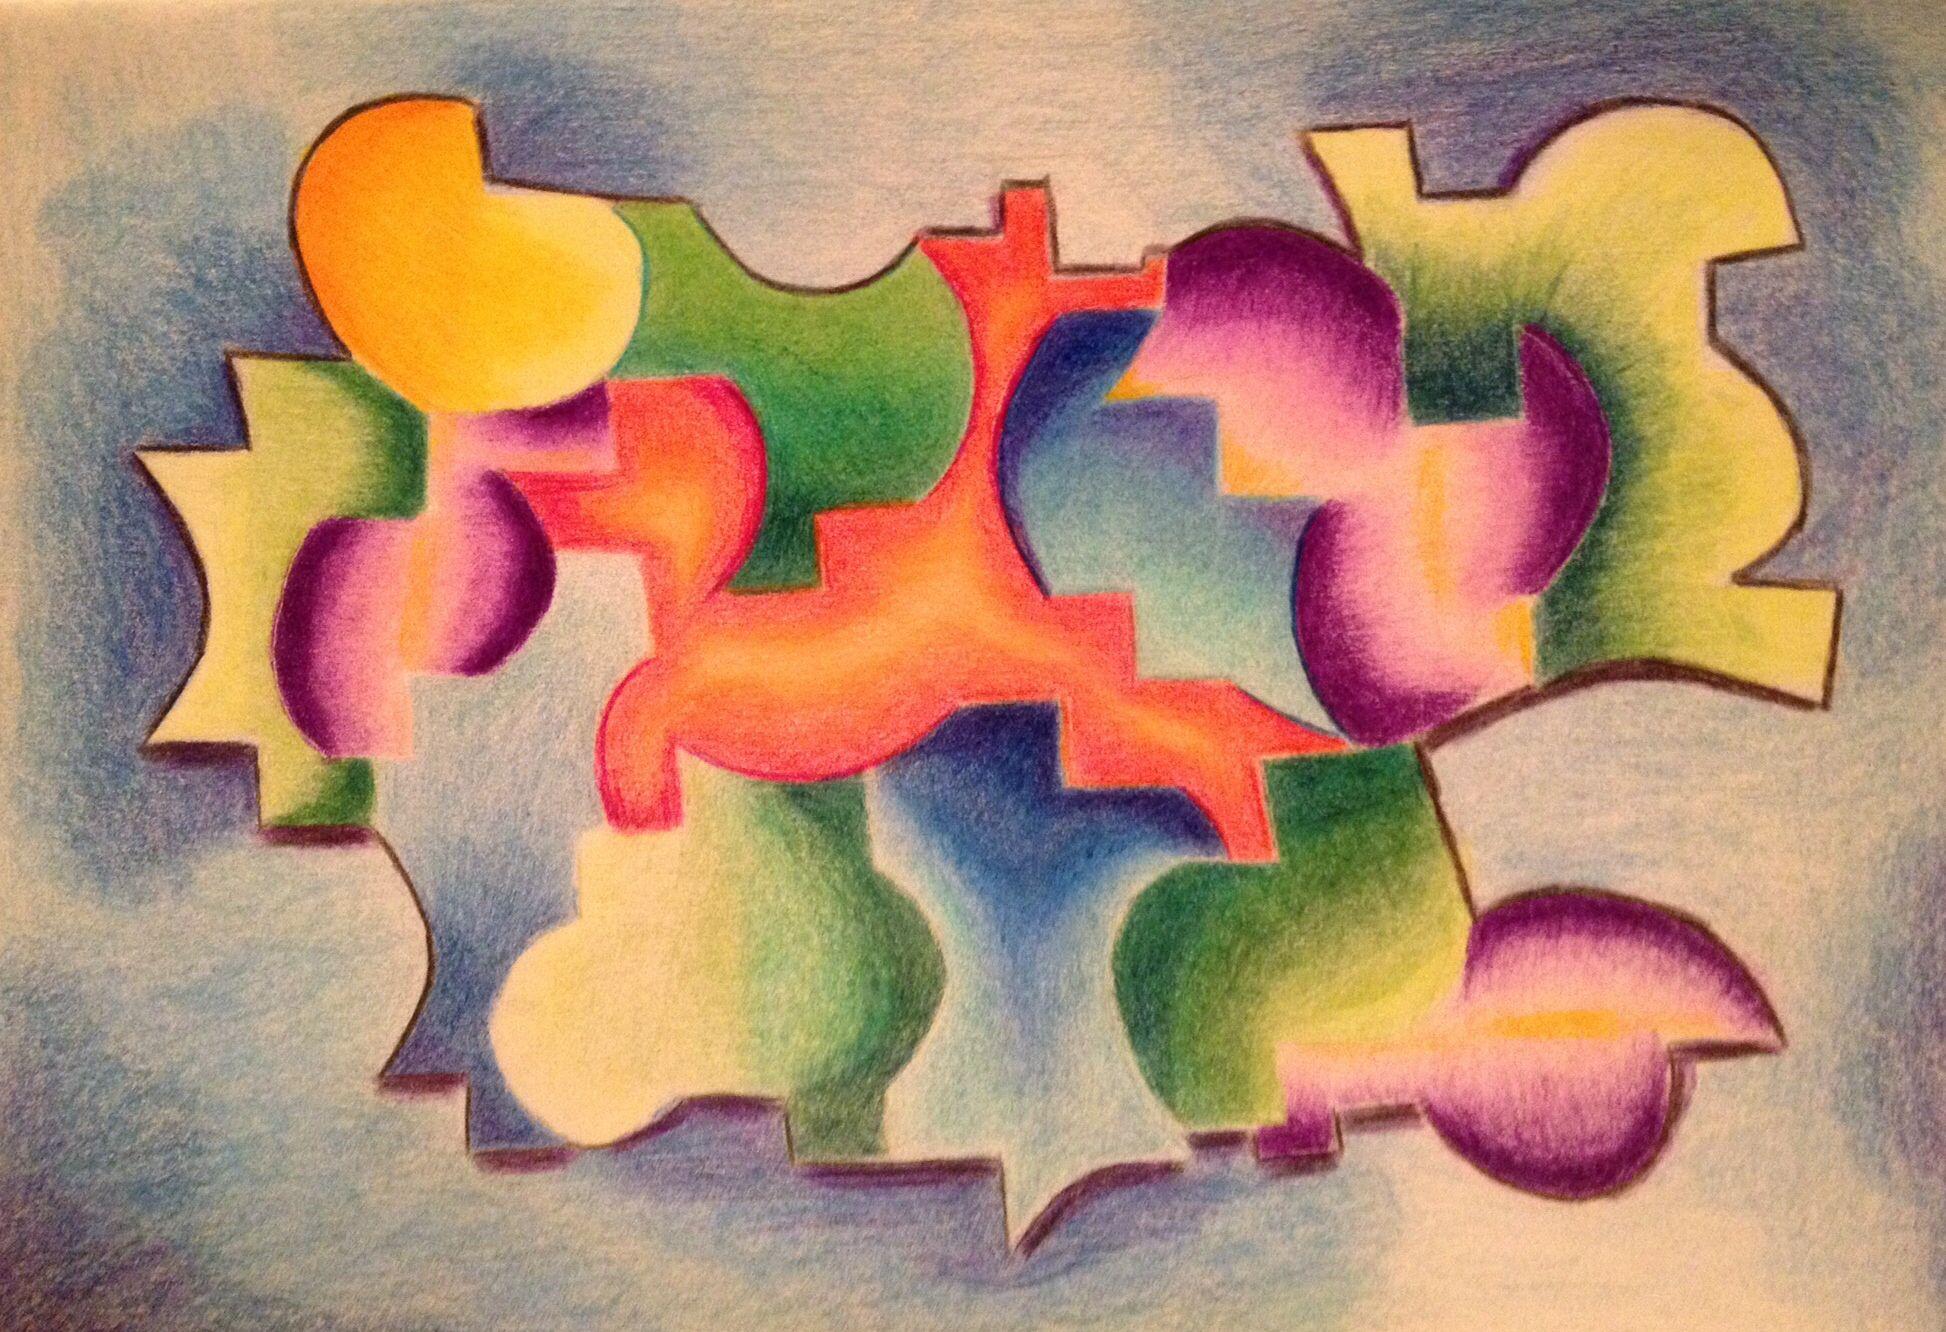 'De 4 elementen' Kleurpotloden 2014